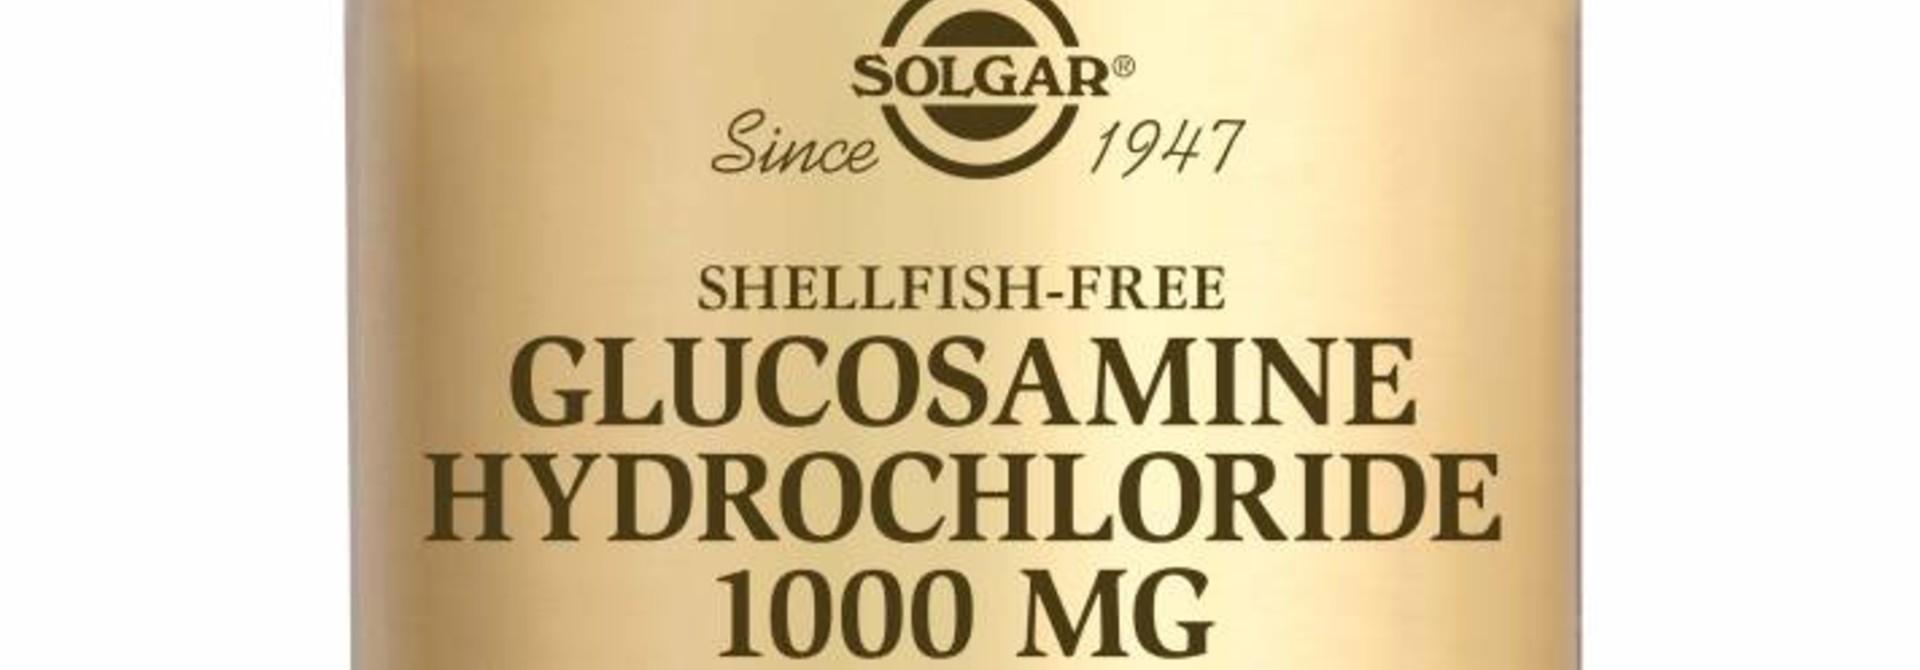 Glucosamine HCl 1000 mg 60 tabletten